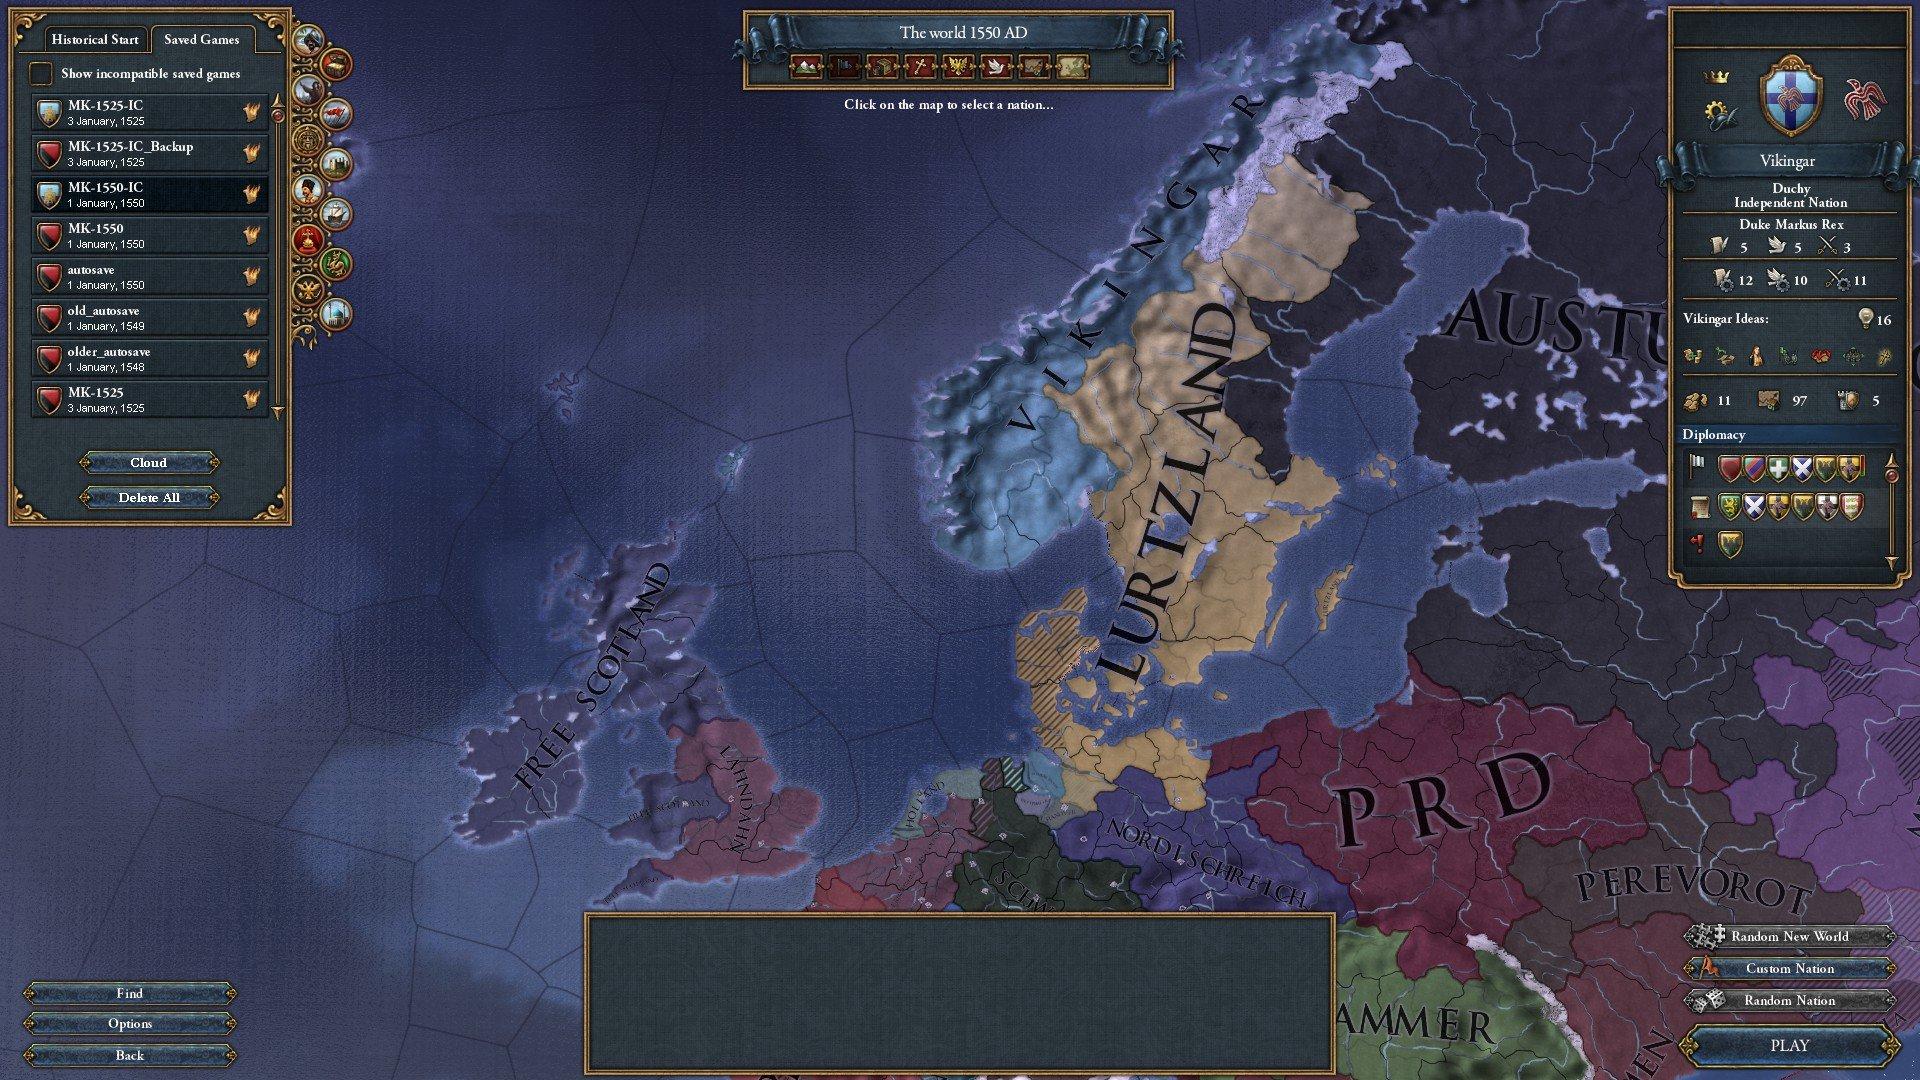 EUIV - Amaranthine Invitational #5 (1550) - After Action Report